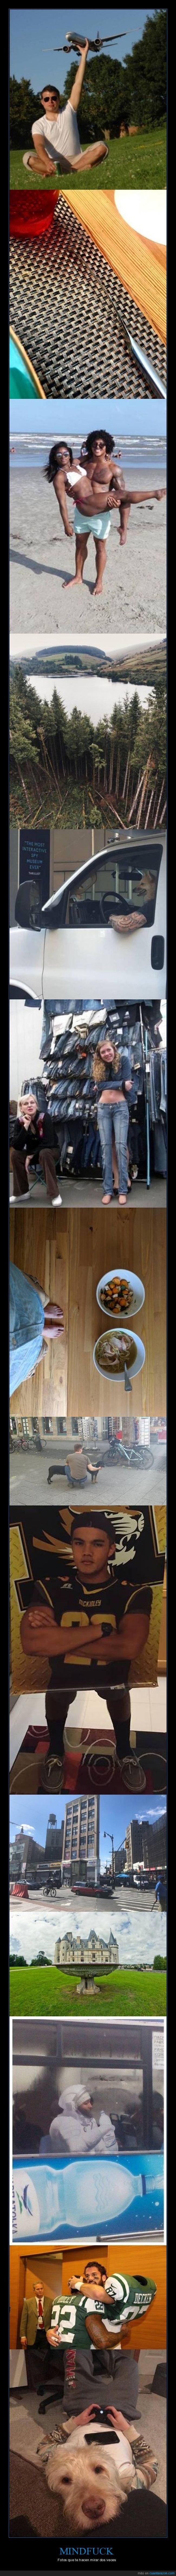 fotos,mindfucks,perspectiva